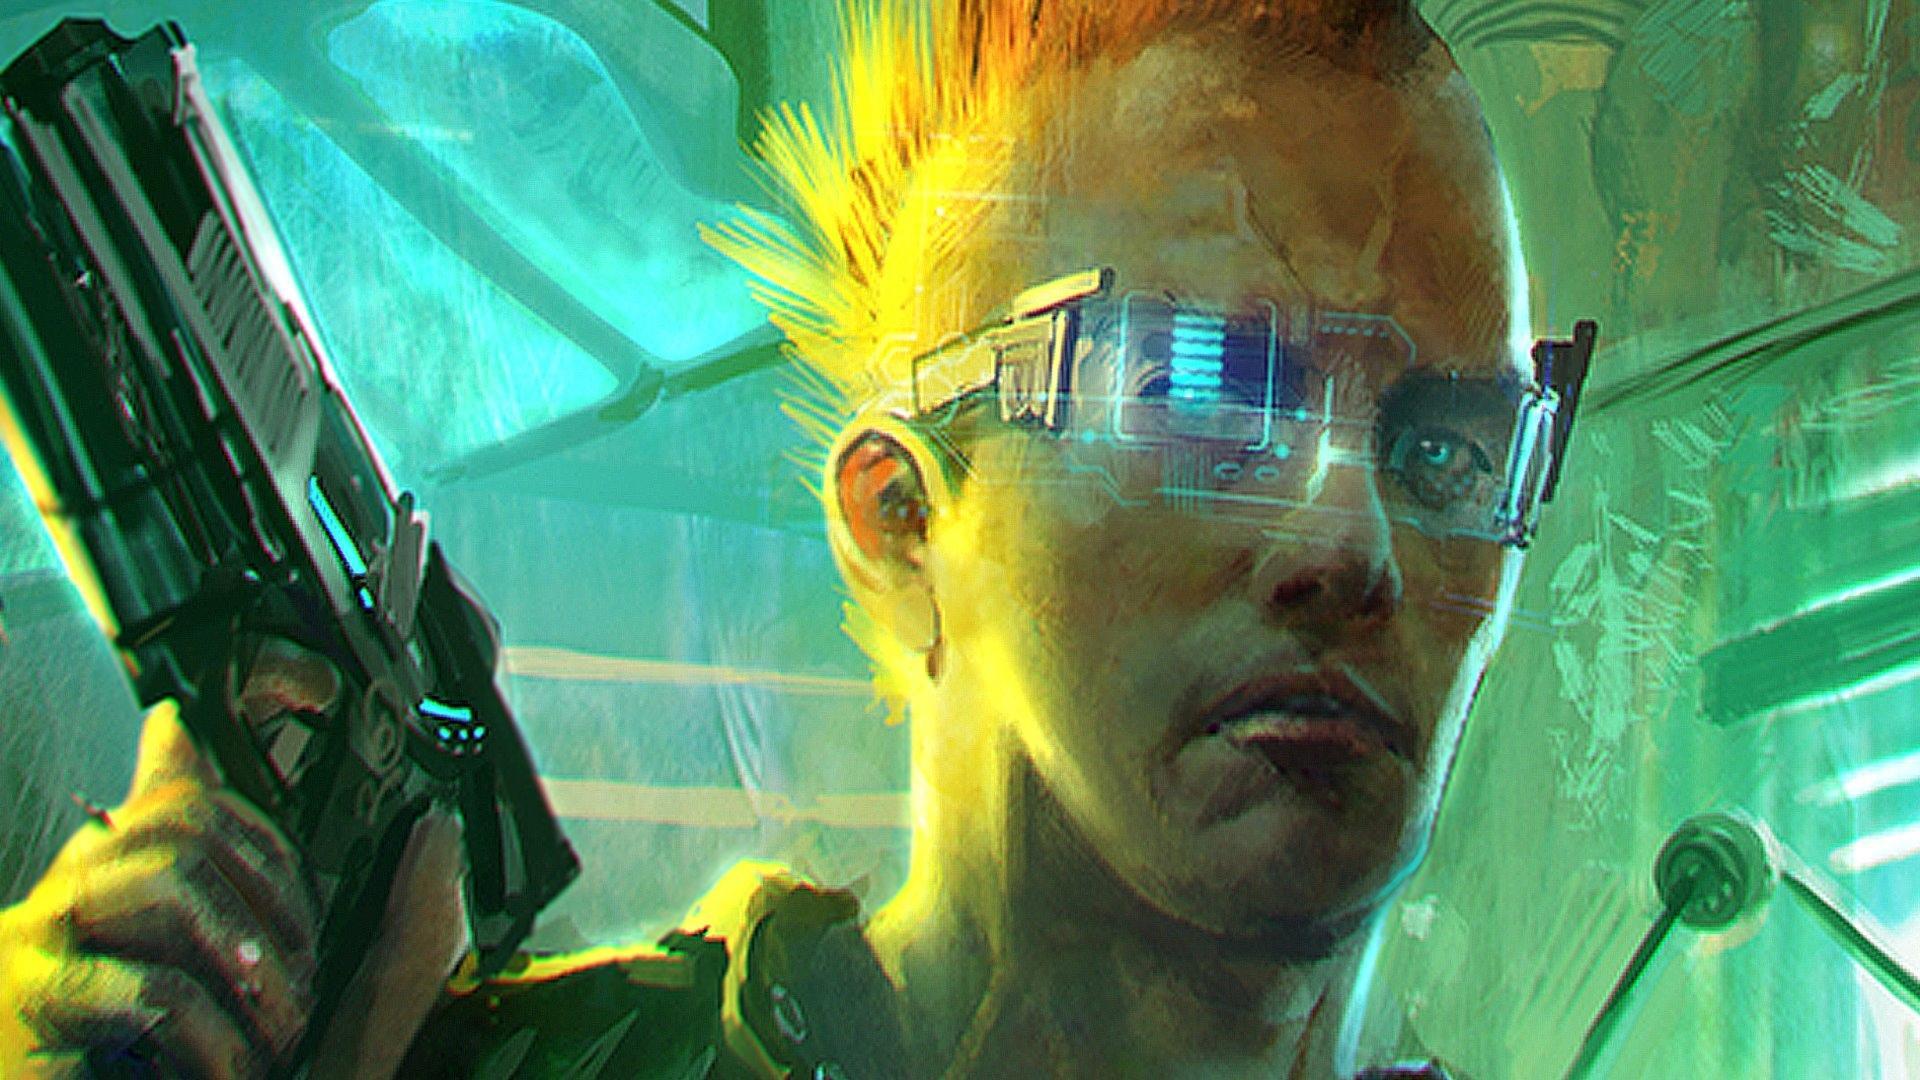 Cyberpunk 2077 Wallpapers Hd: Cyberpunk 2077 Wallpaper HD Download